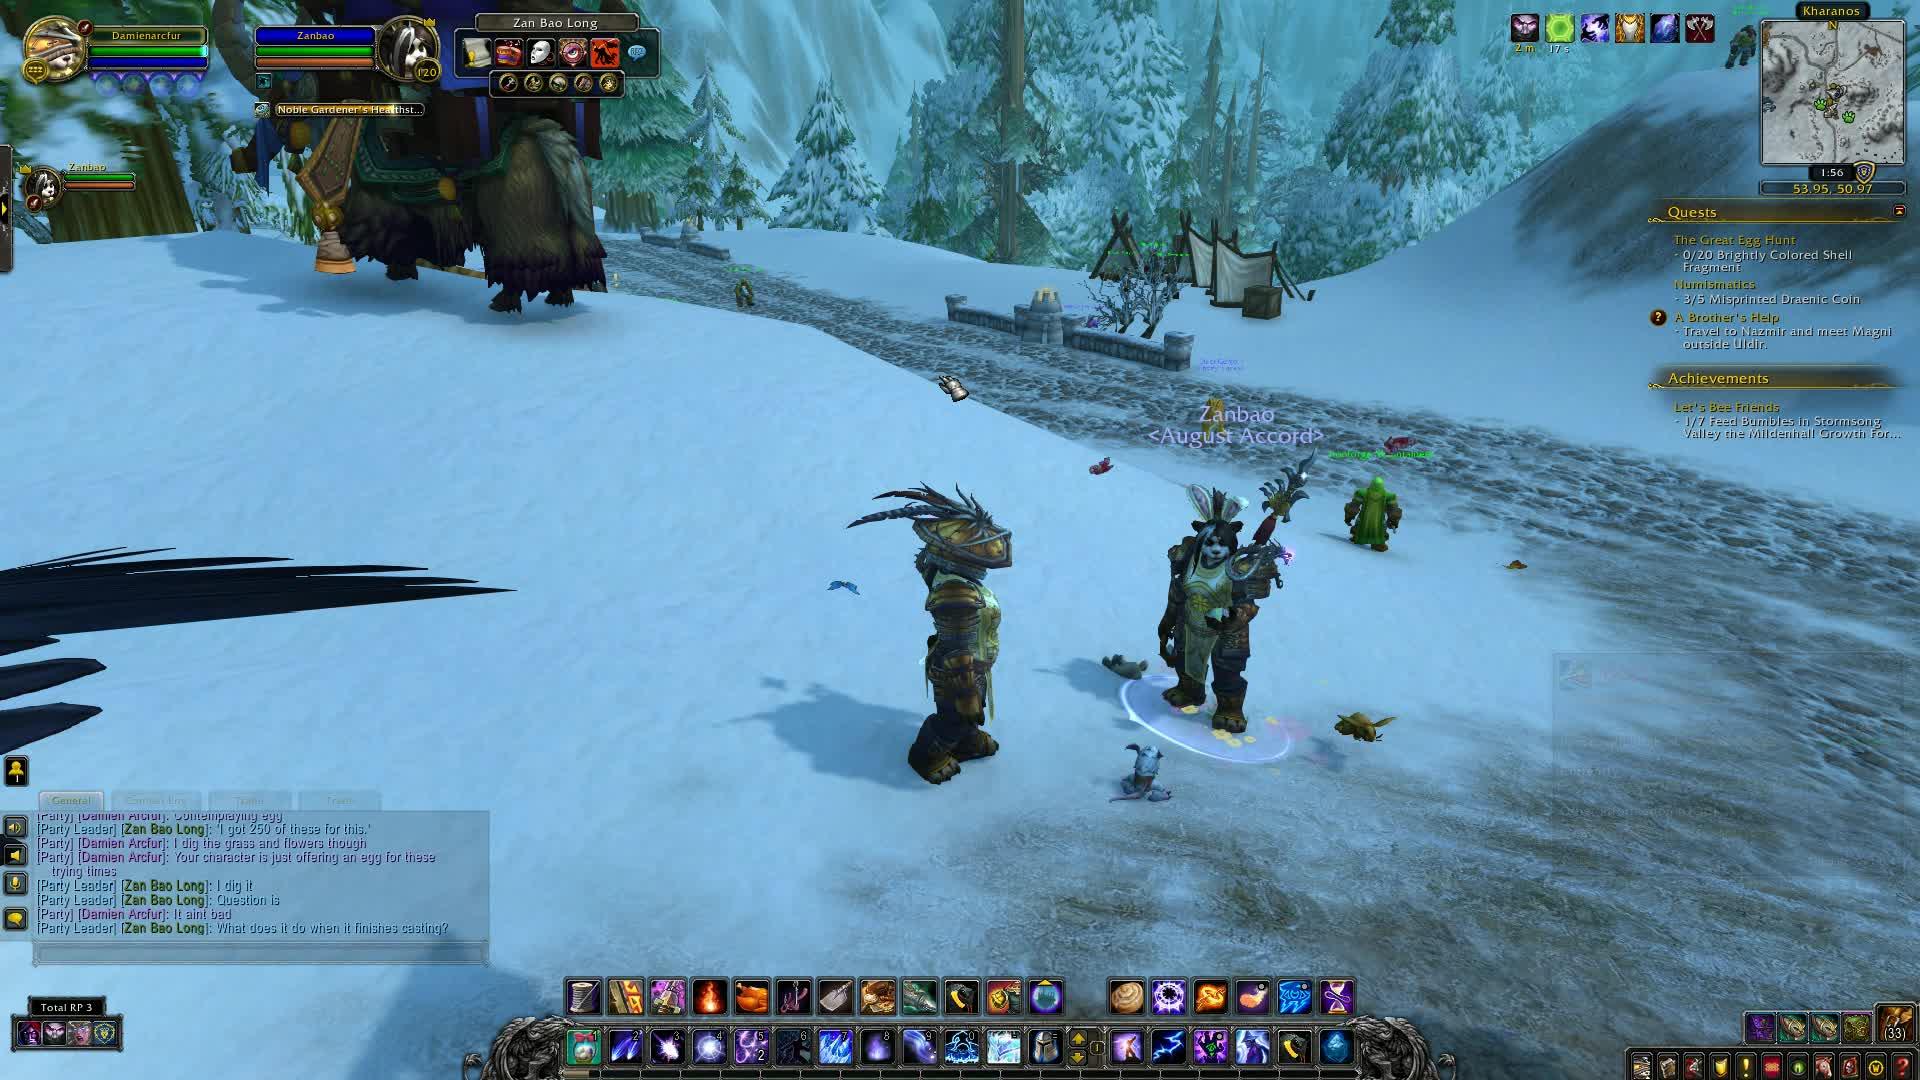 worldofwarcraft, World Of Warcraft 2019.04.22 - 13.57.00.42.DVR GIFs